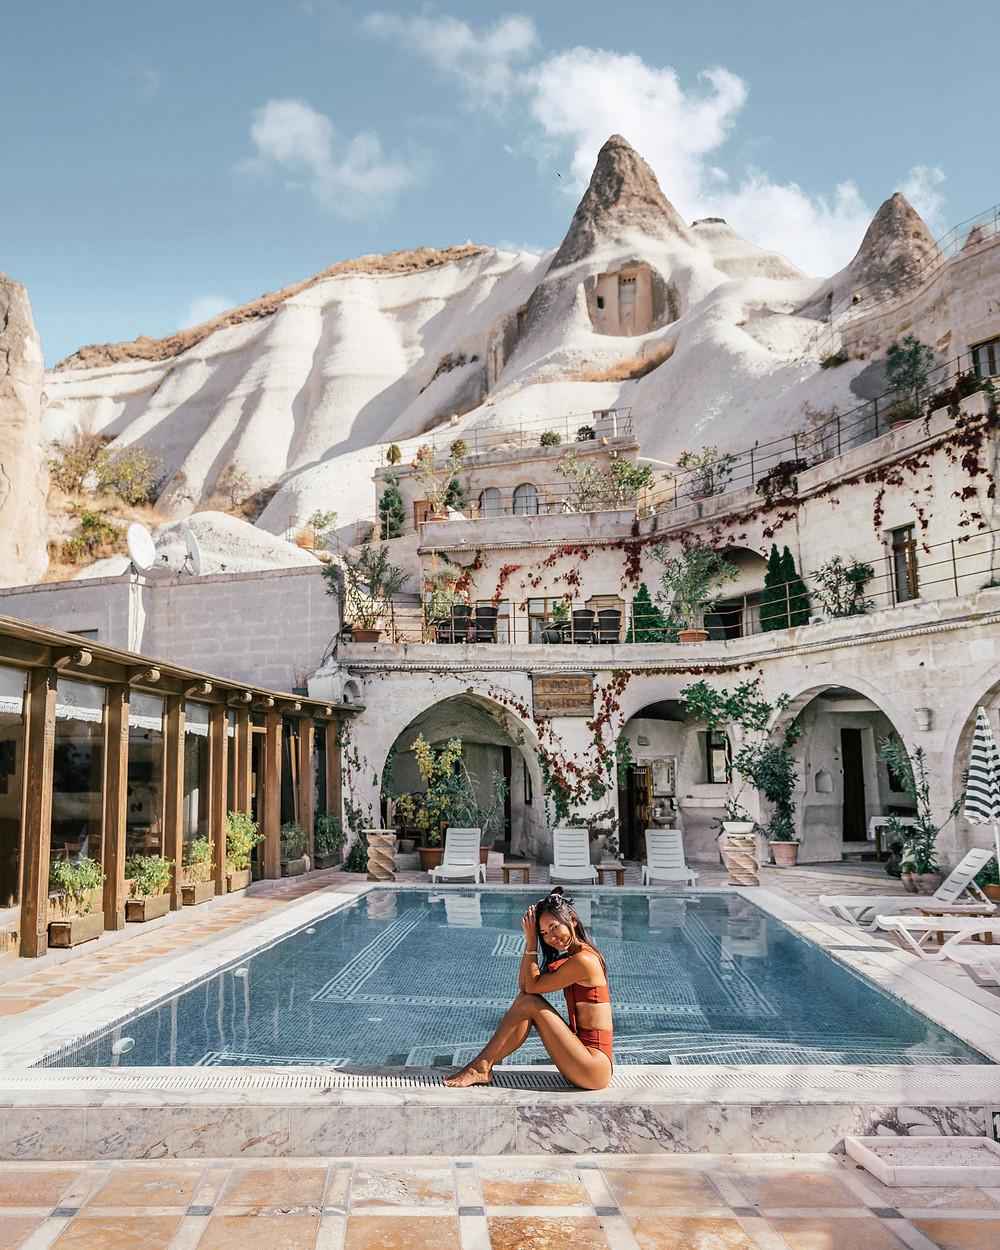 Local Cave House, Goreme, Cappadocia, Turkey